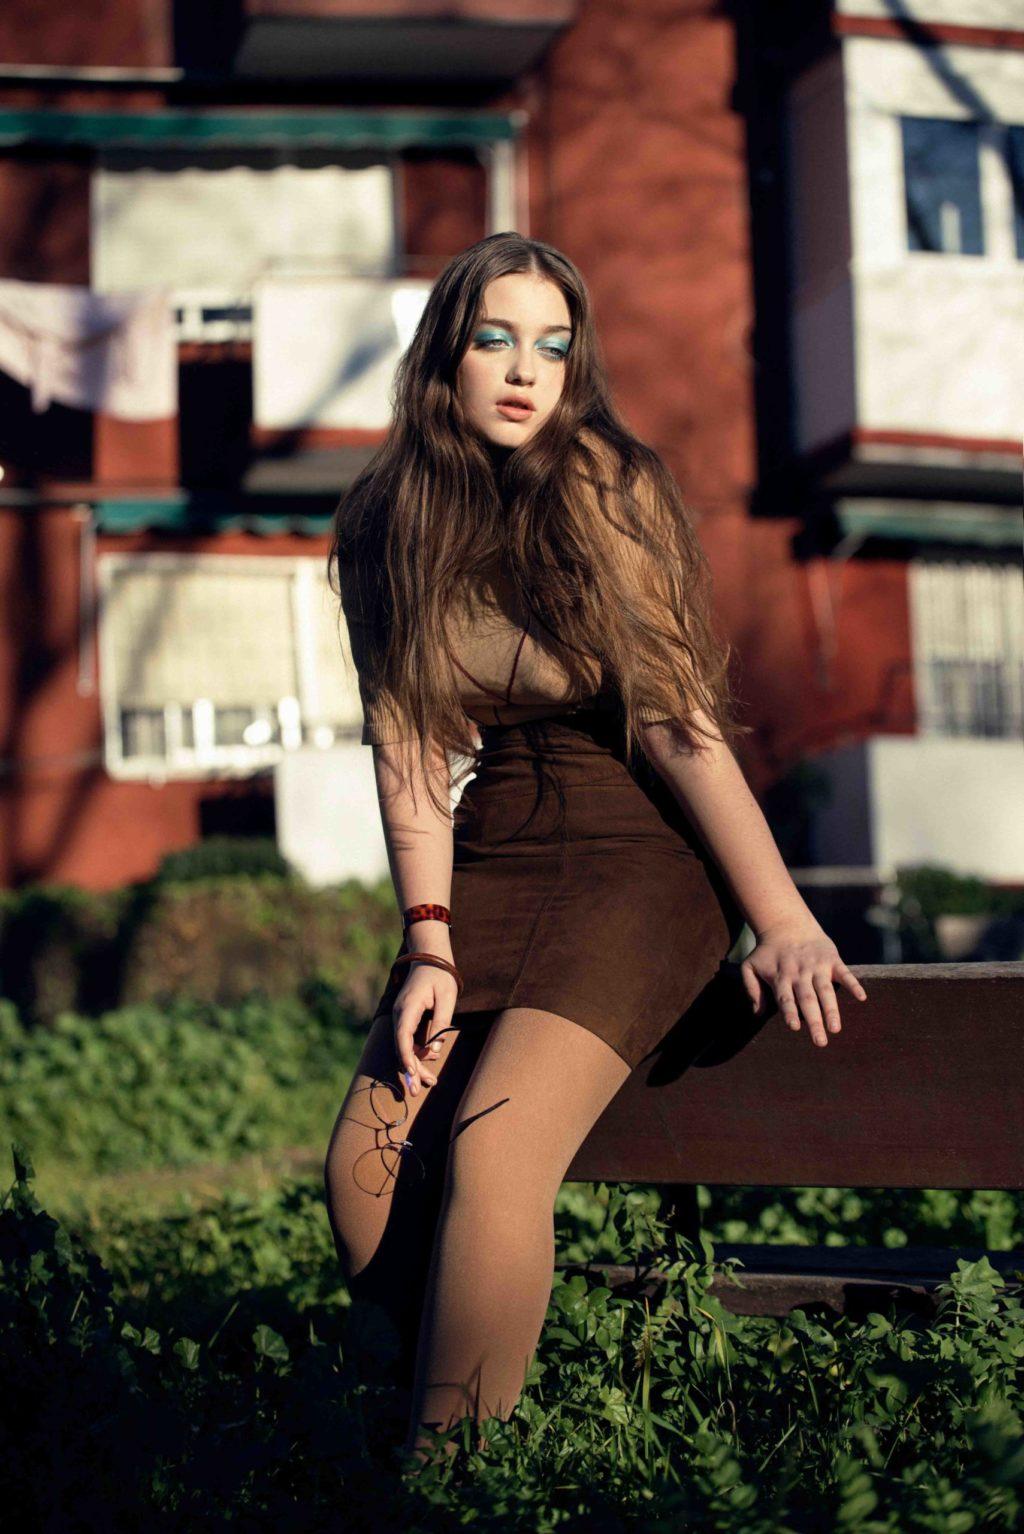 brown, skirt, glasses, long hair, pose